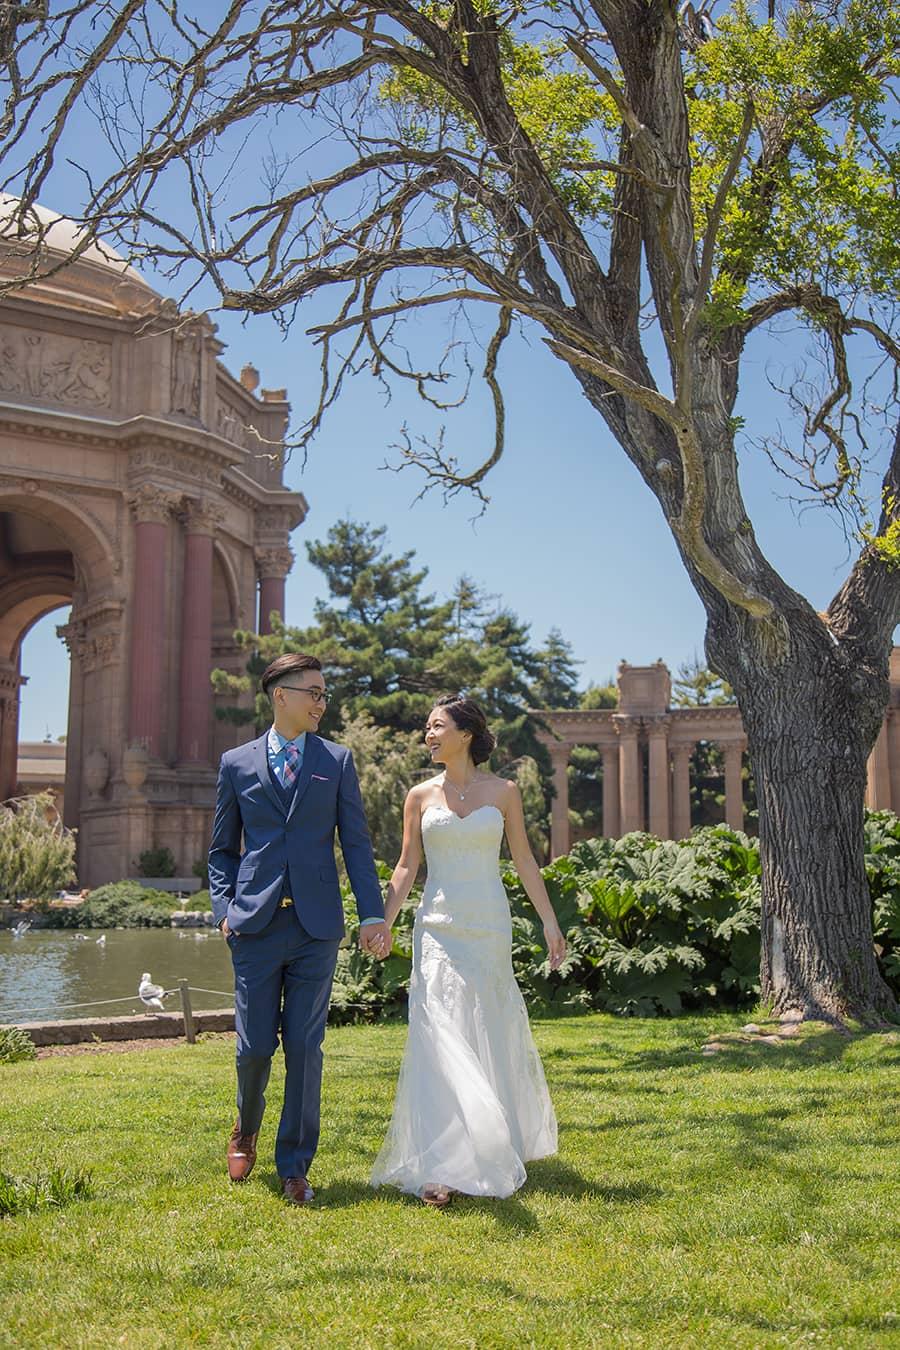 SF wedding,舊金山婚紗,海外婚紗,金門大橋婚紗,舊金山婚攝,舊金山婚禮,OVERSEA san francisco,婚攝推薦,舊金山海外婚紗